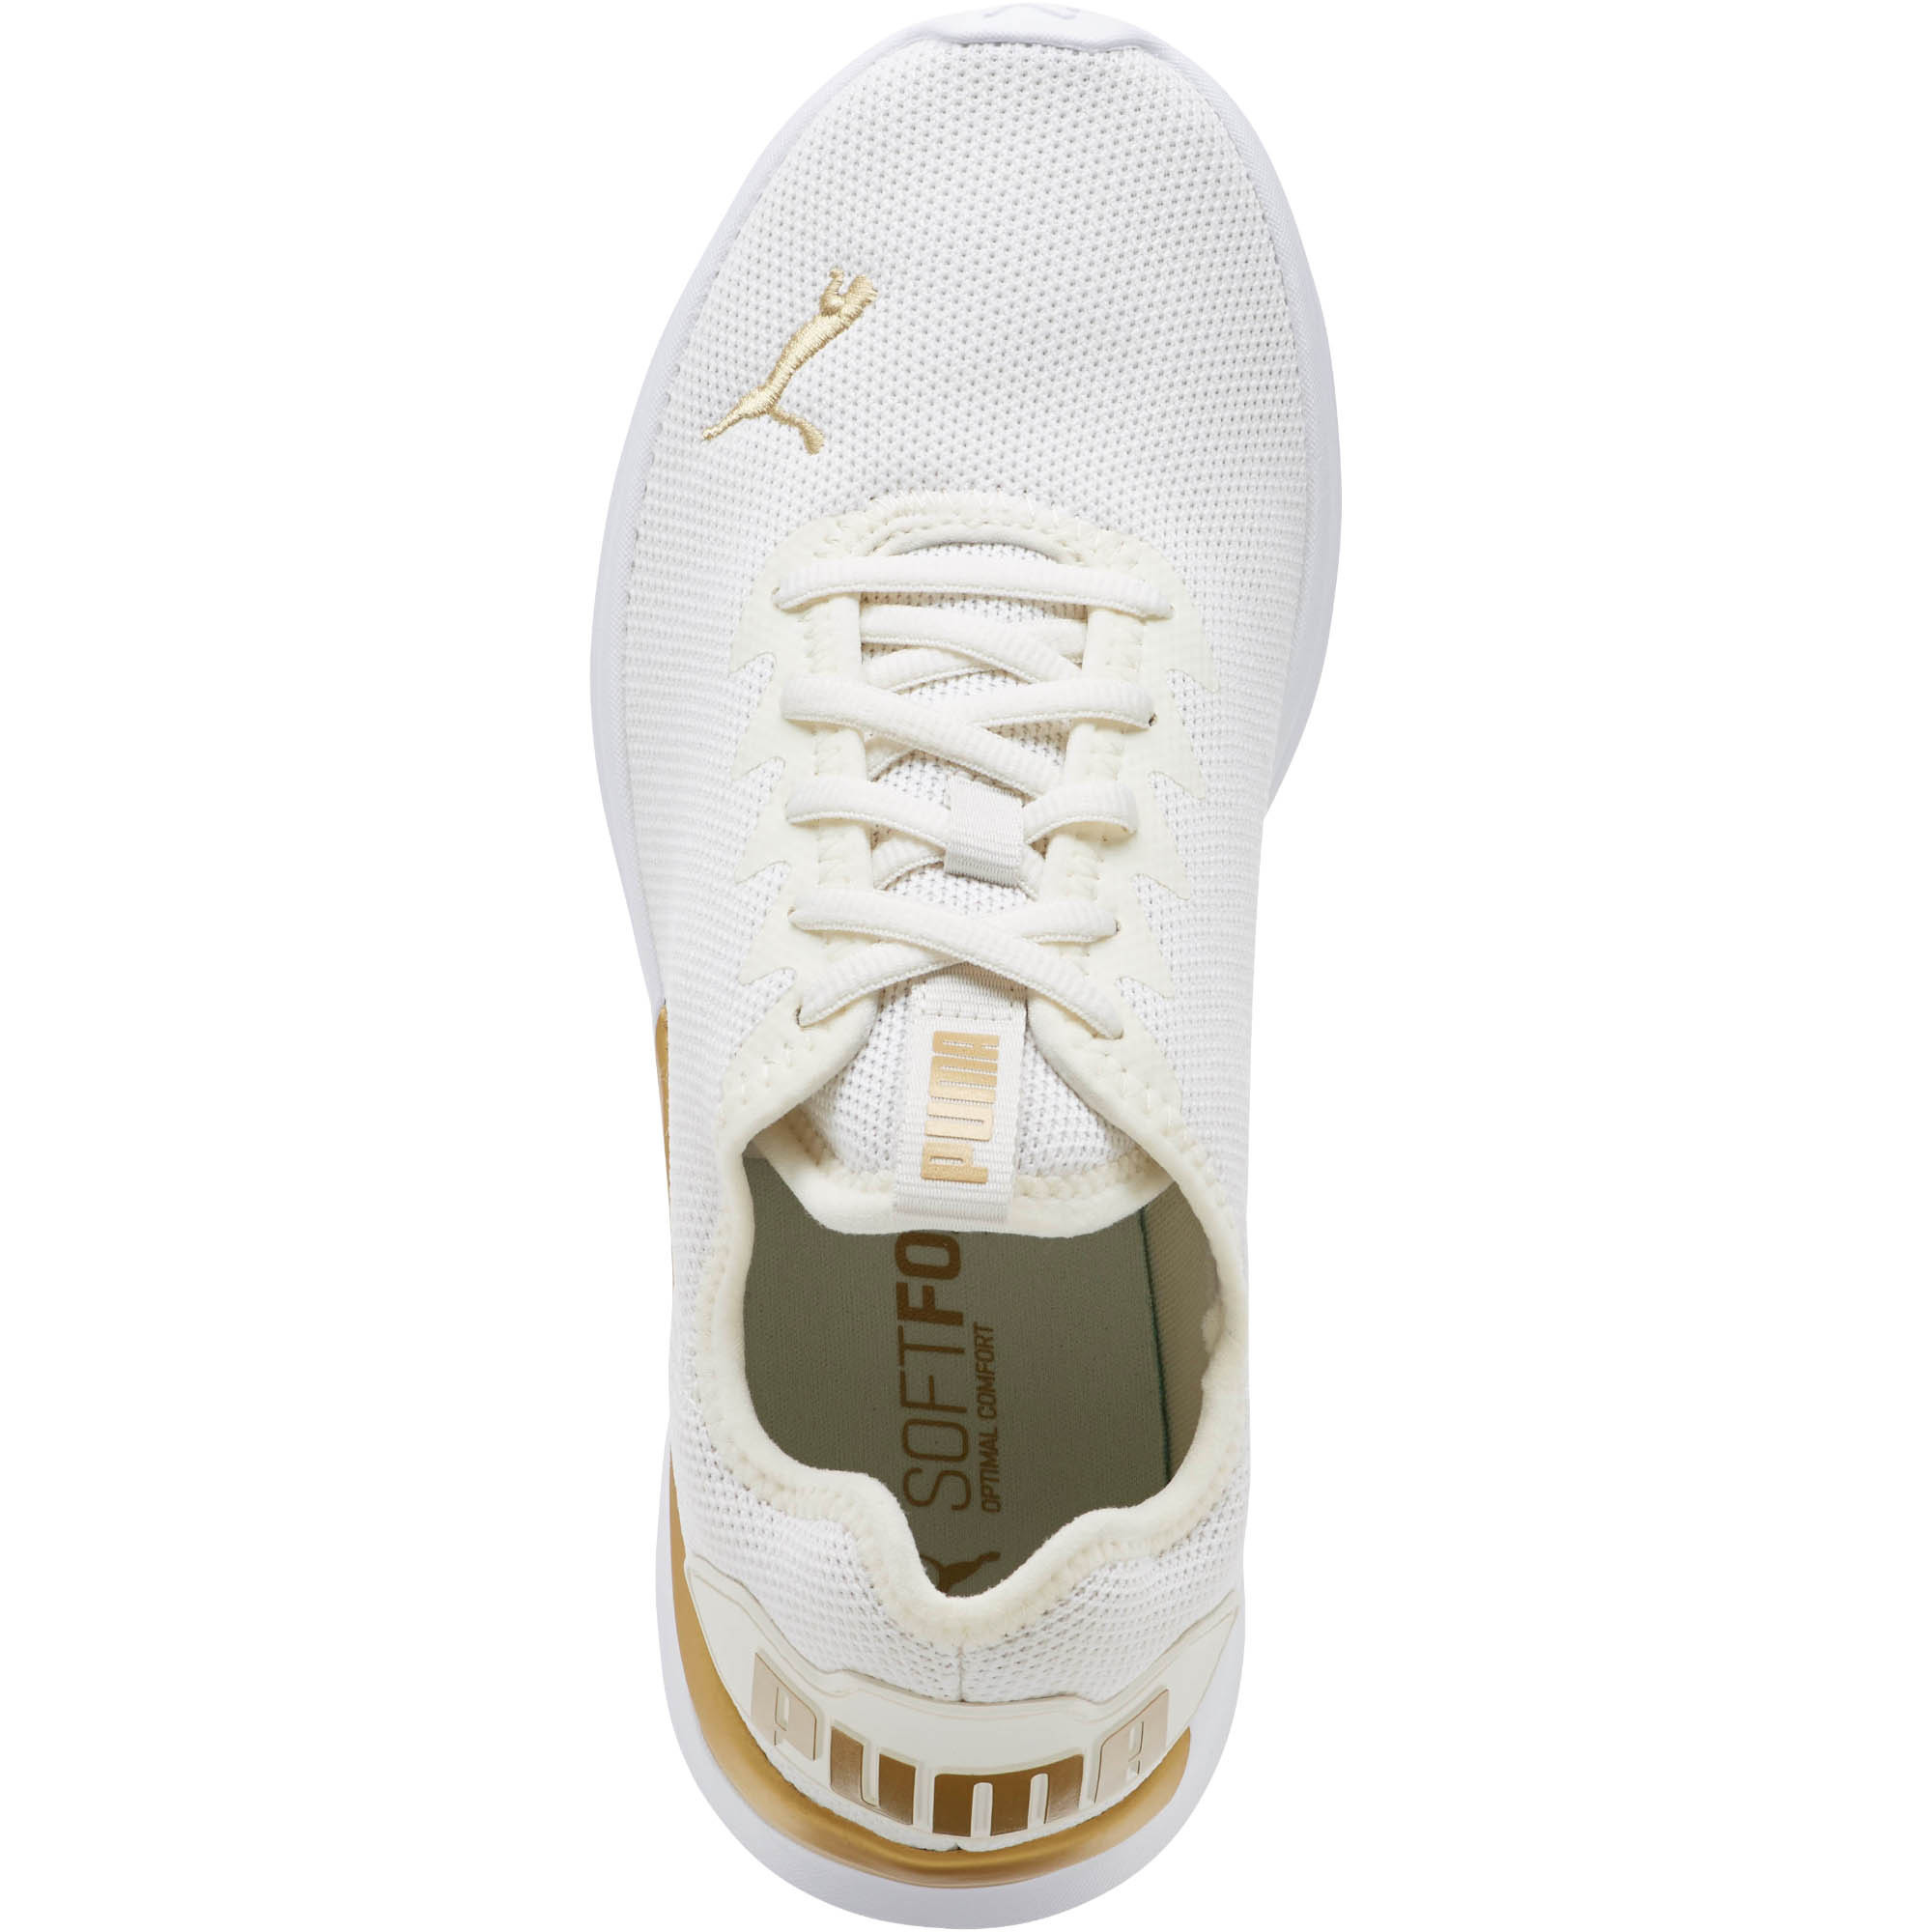 PUMA-Ballast-Women-039-s-Running-Shoes-Women-Shoe-Running thumbnail 16